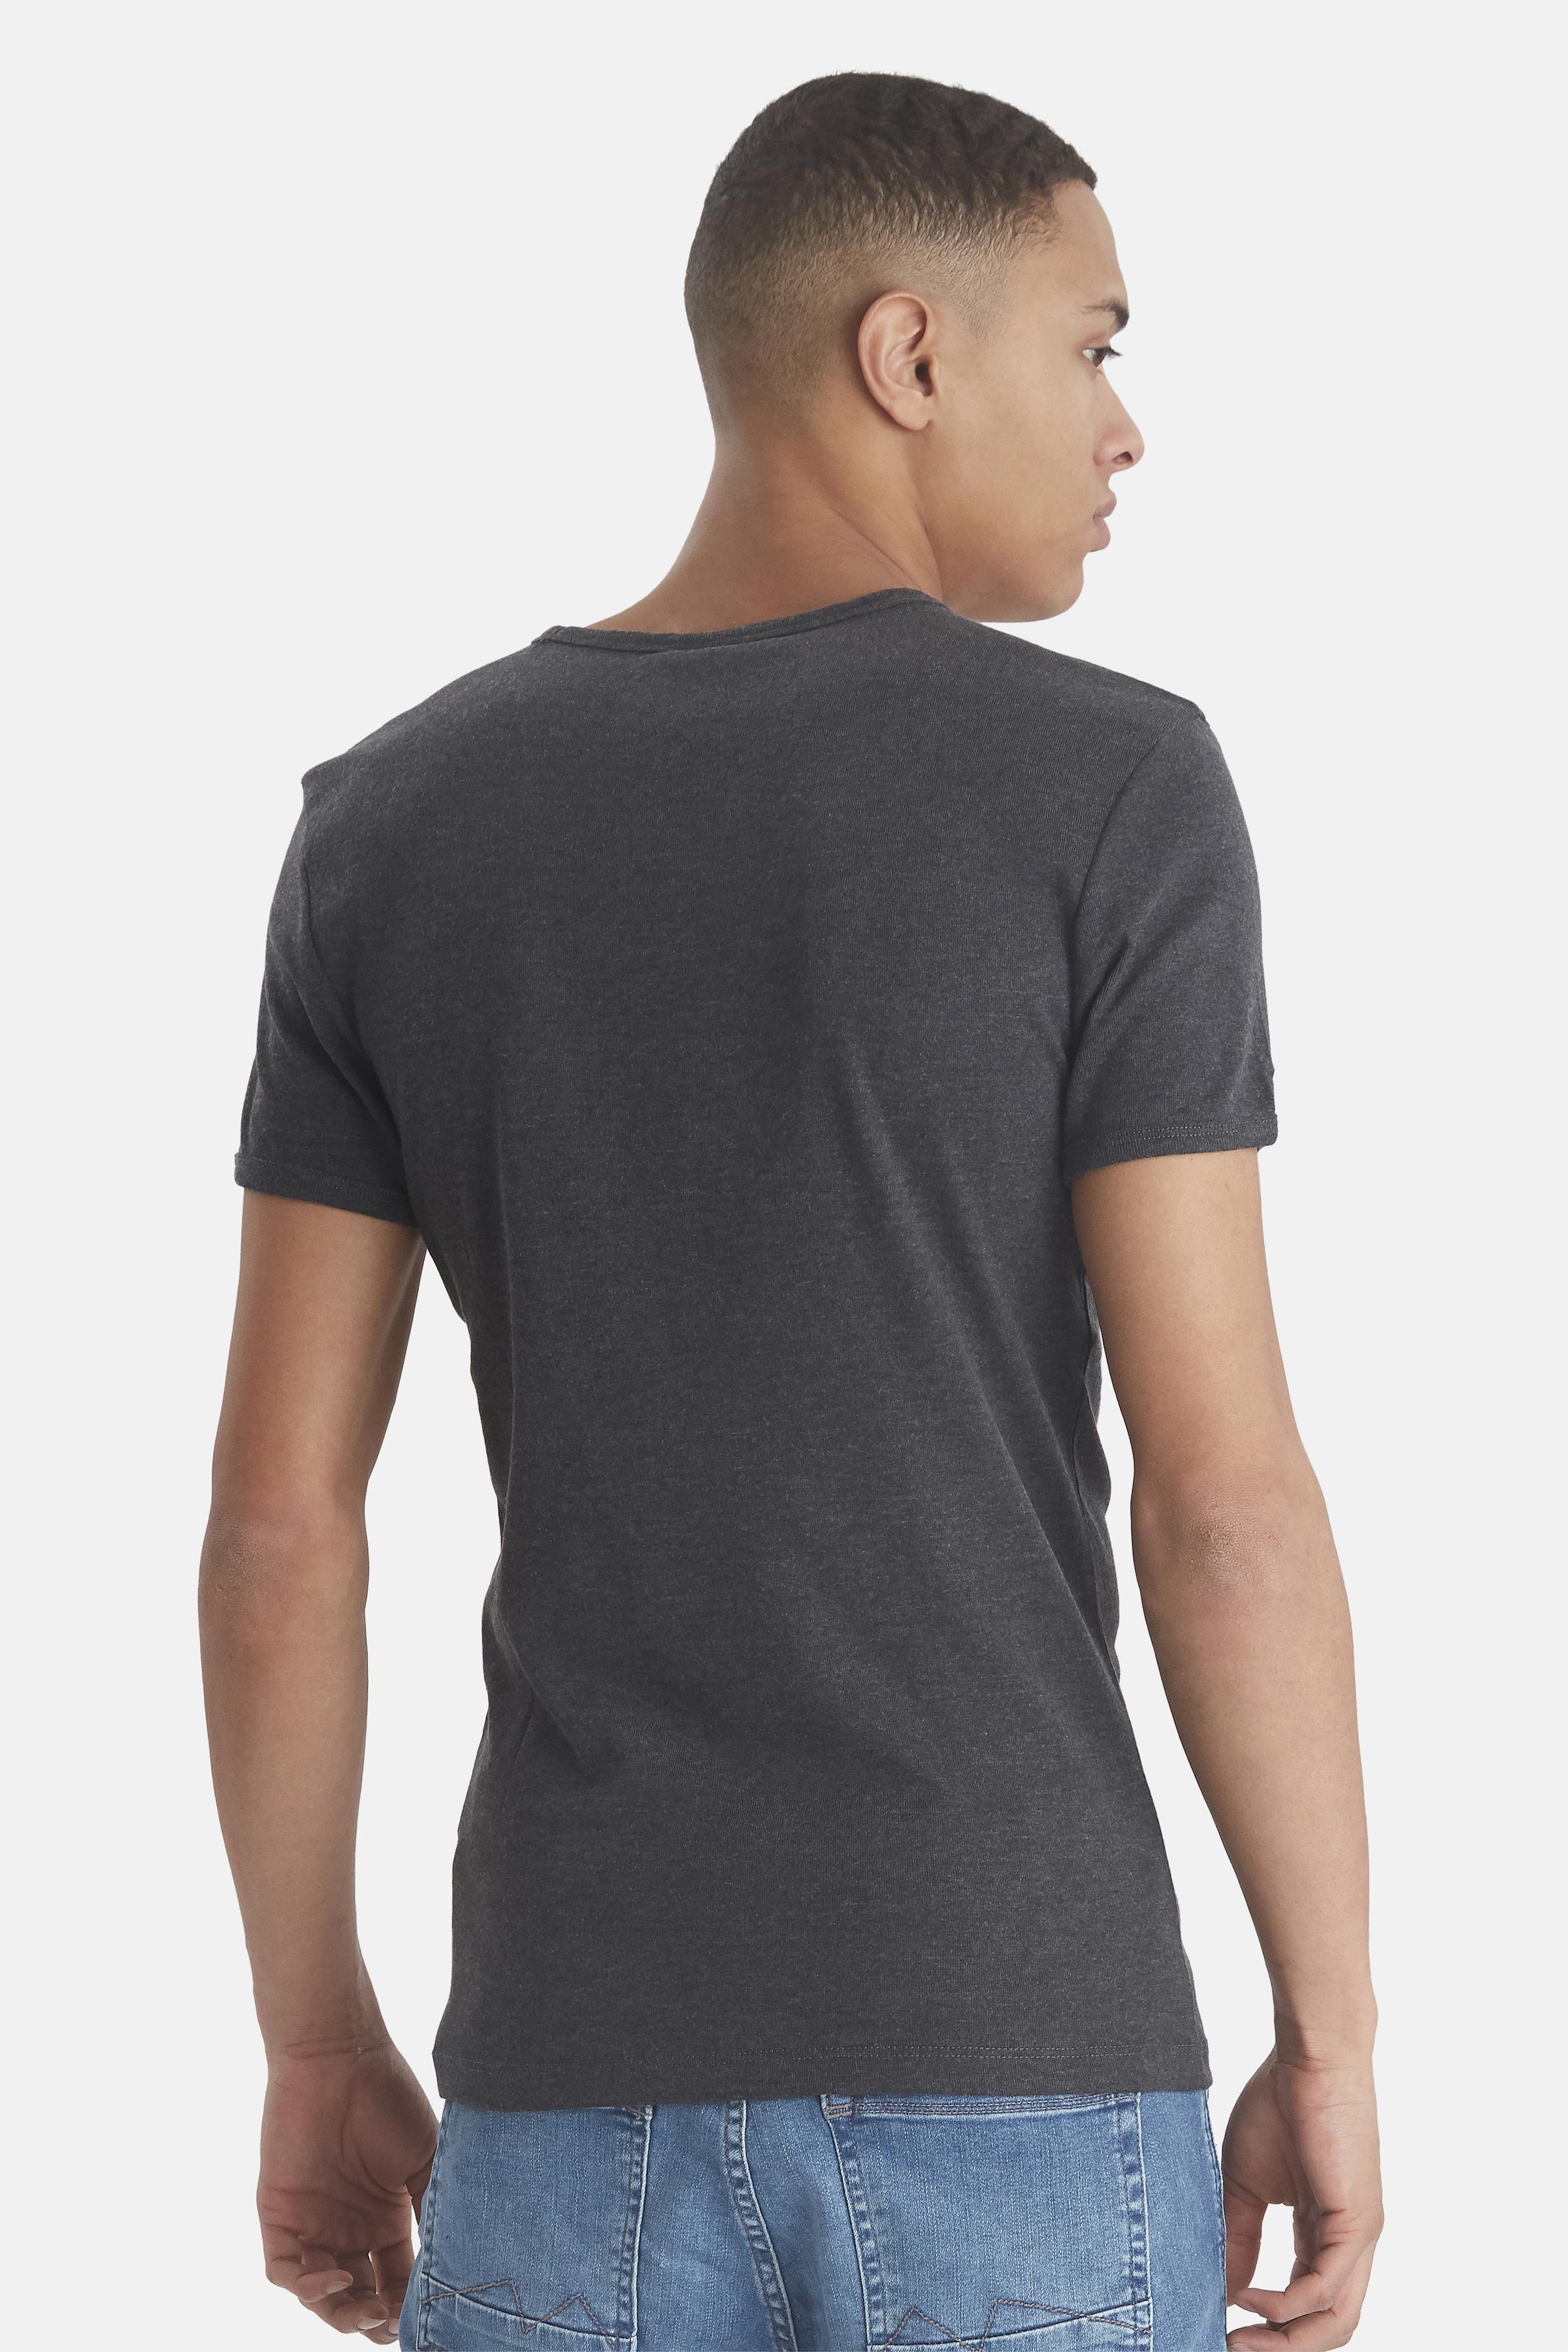 Black T-shirt – Køb Black T-shirt fra str. XS-3XL her